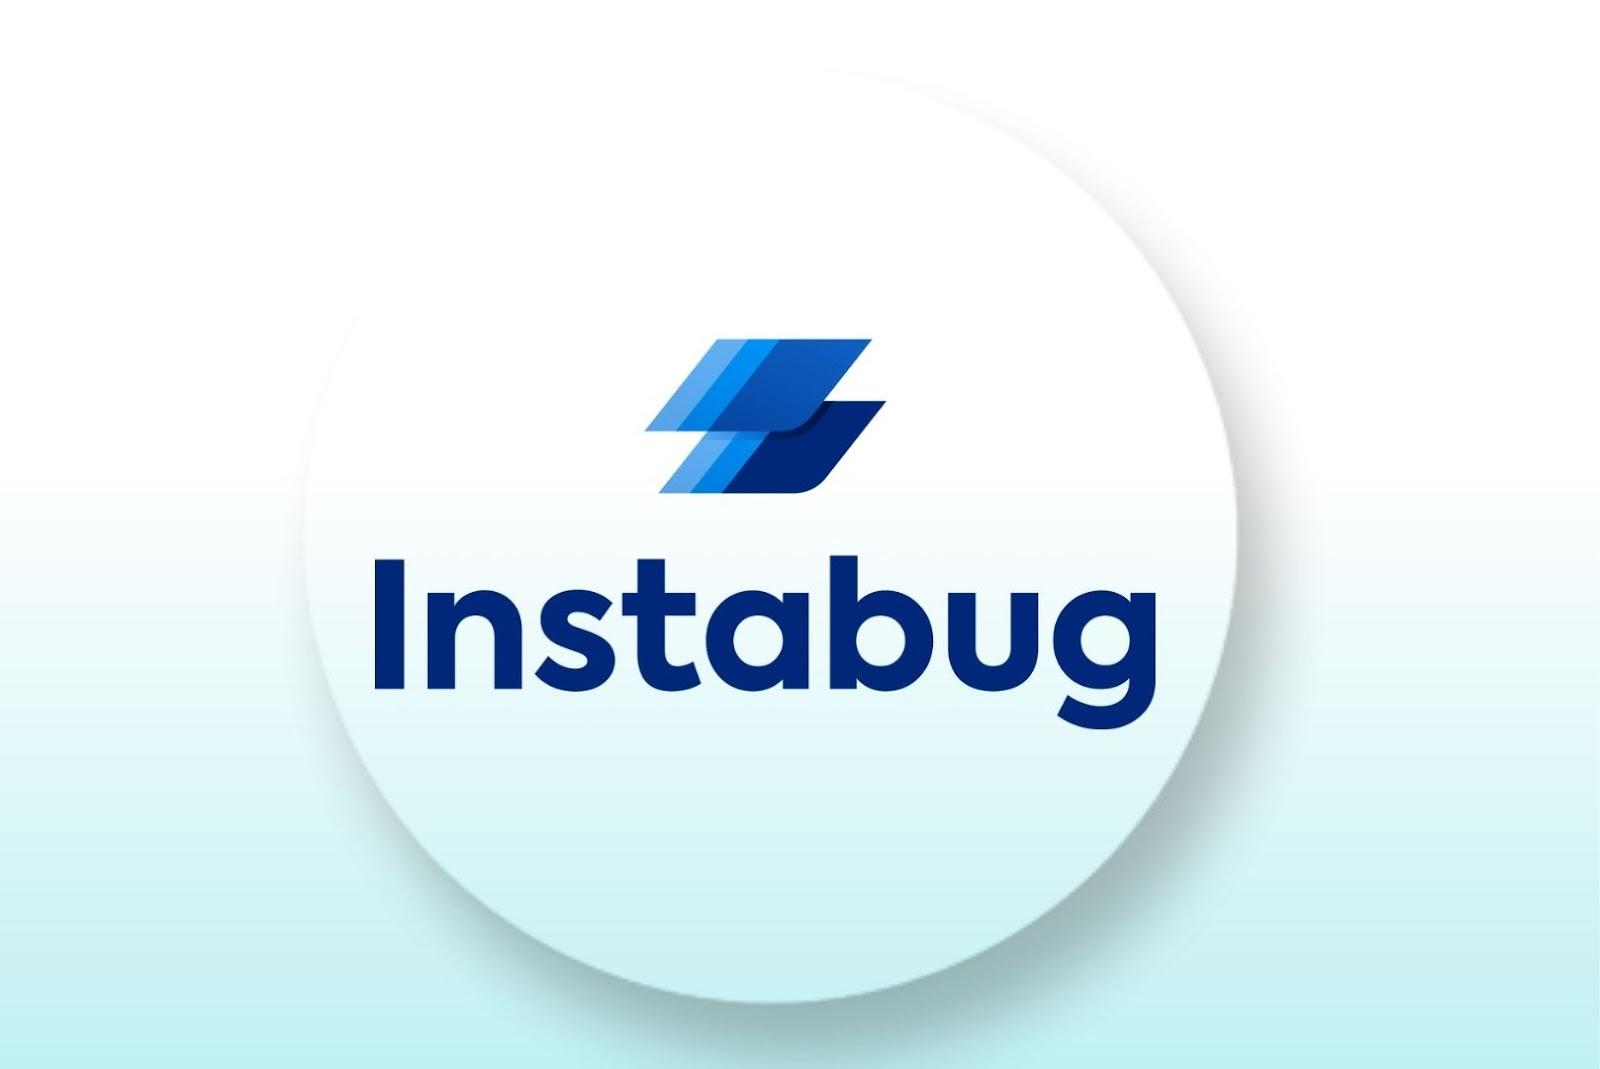 Instabug flutter app development tools